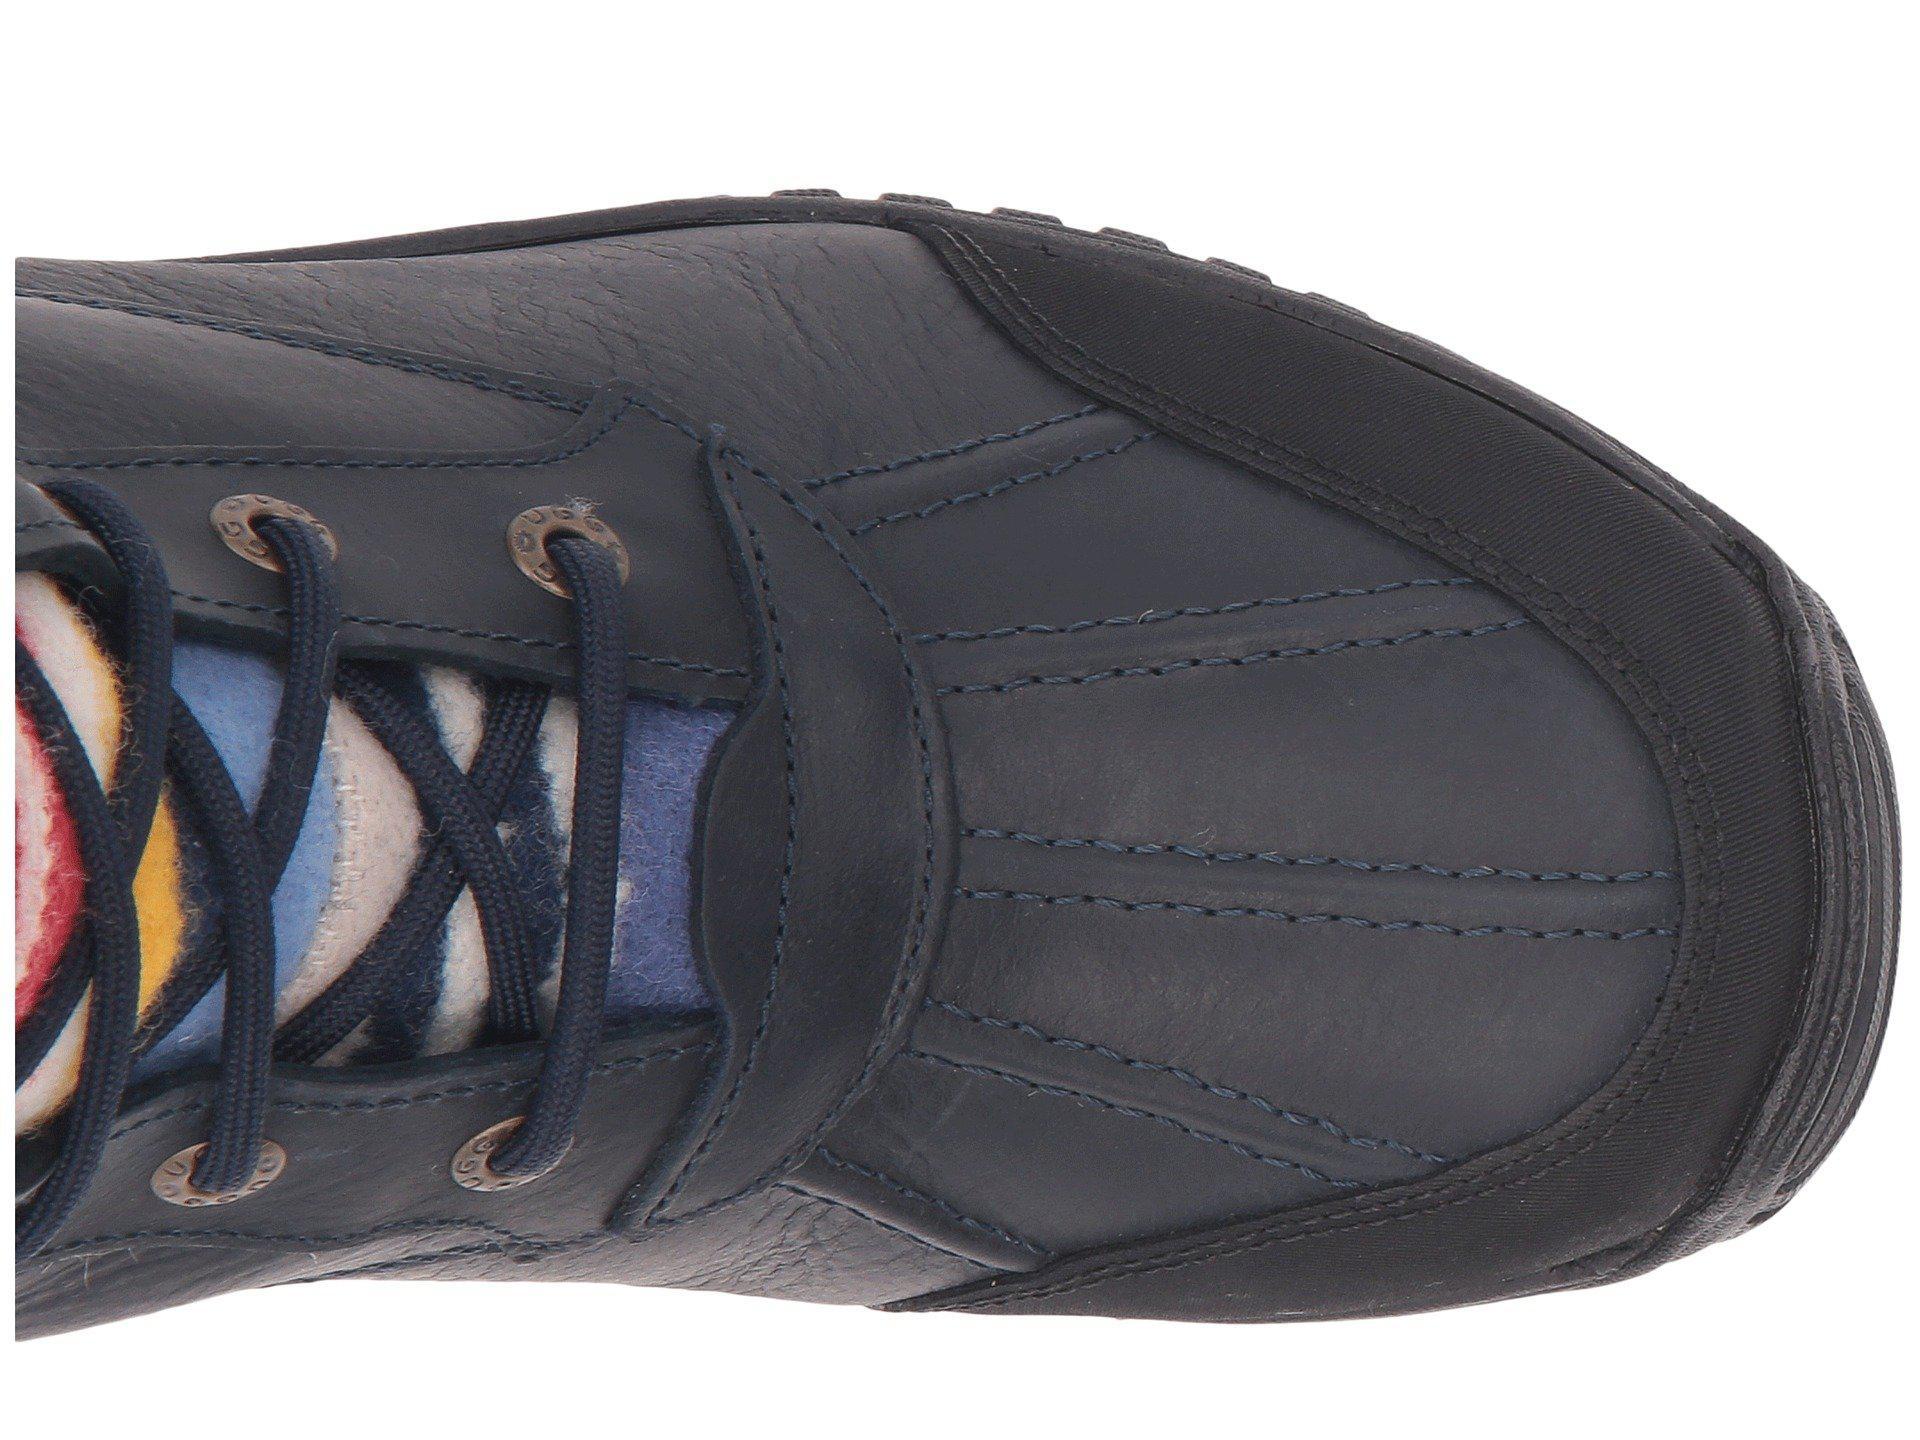 f57ae4061f9 Ugg Blue Adirondack Tall Np Yosemite (navy) Women's Shoes